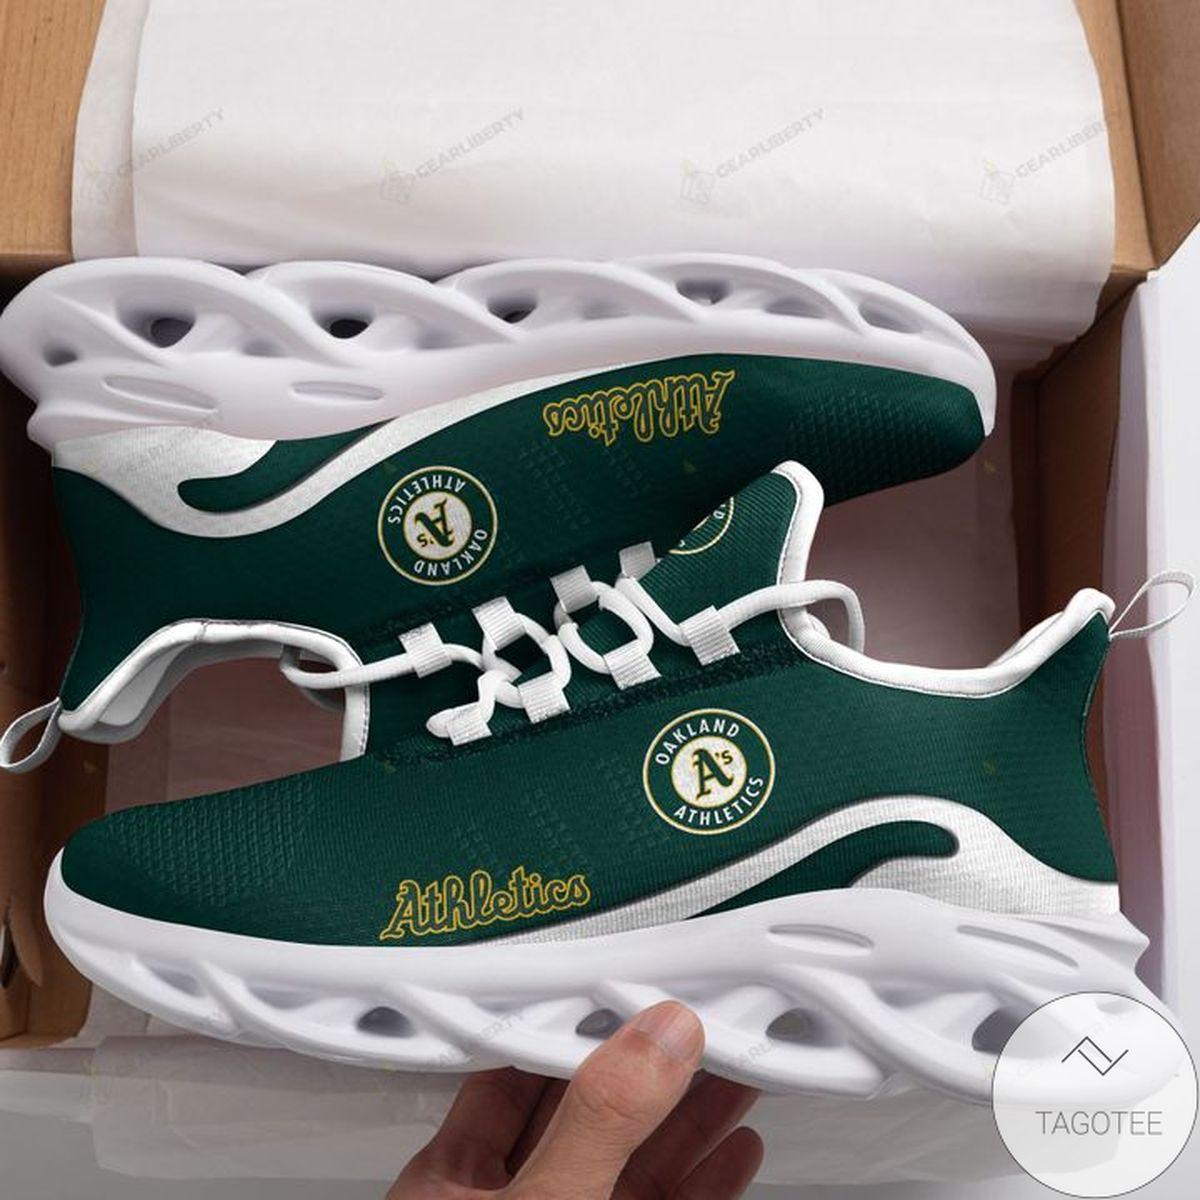 MLB Oakland Athletics Max Soul Shoes